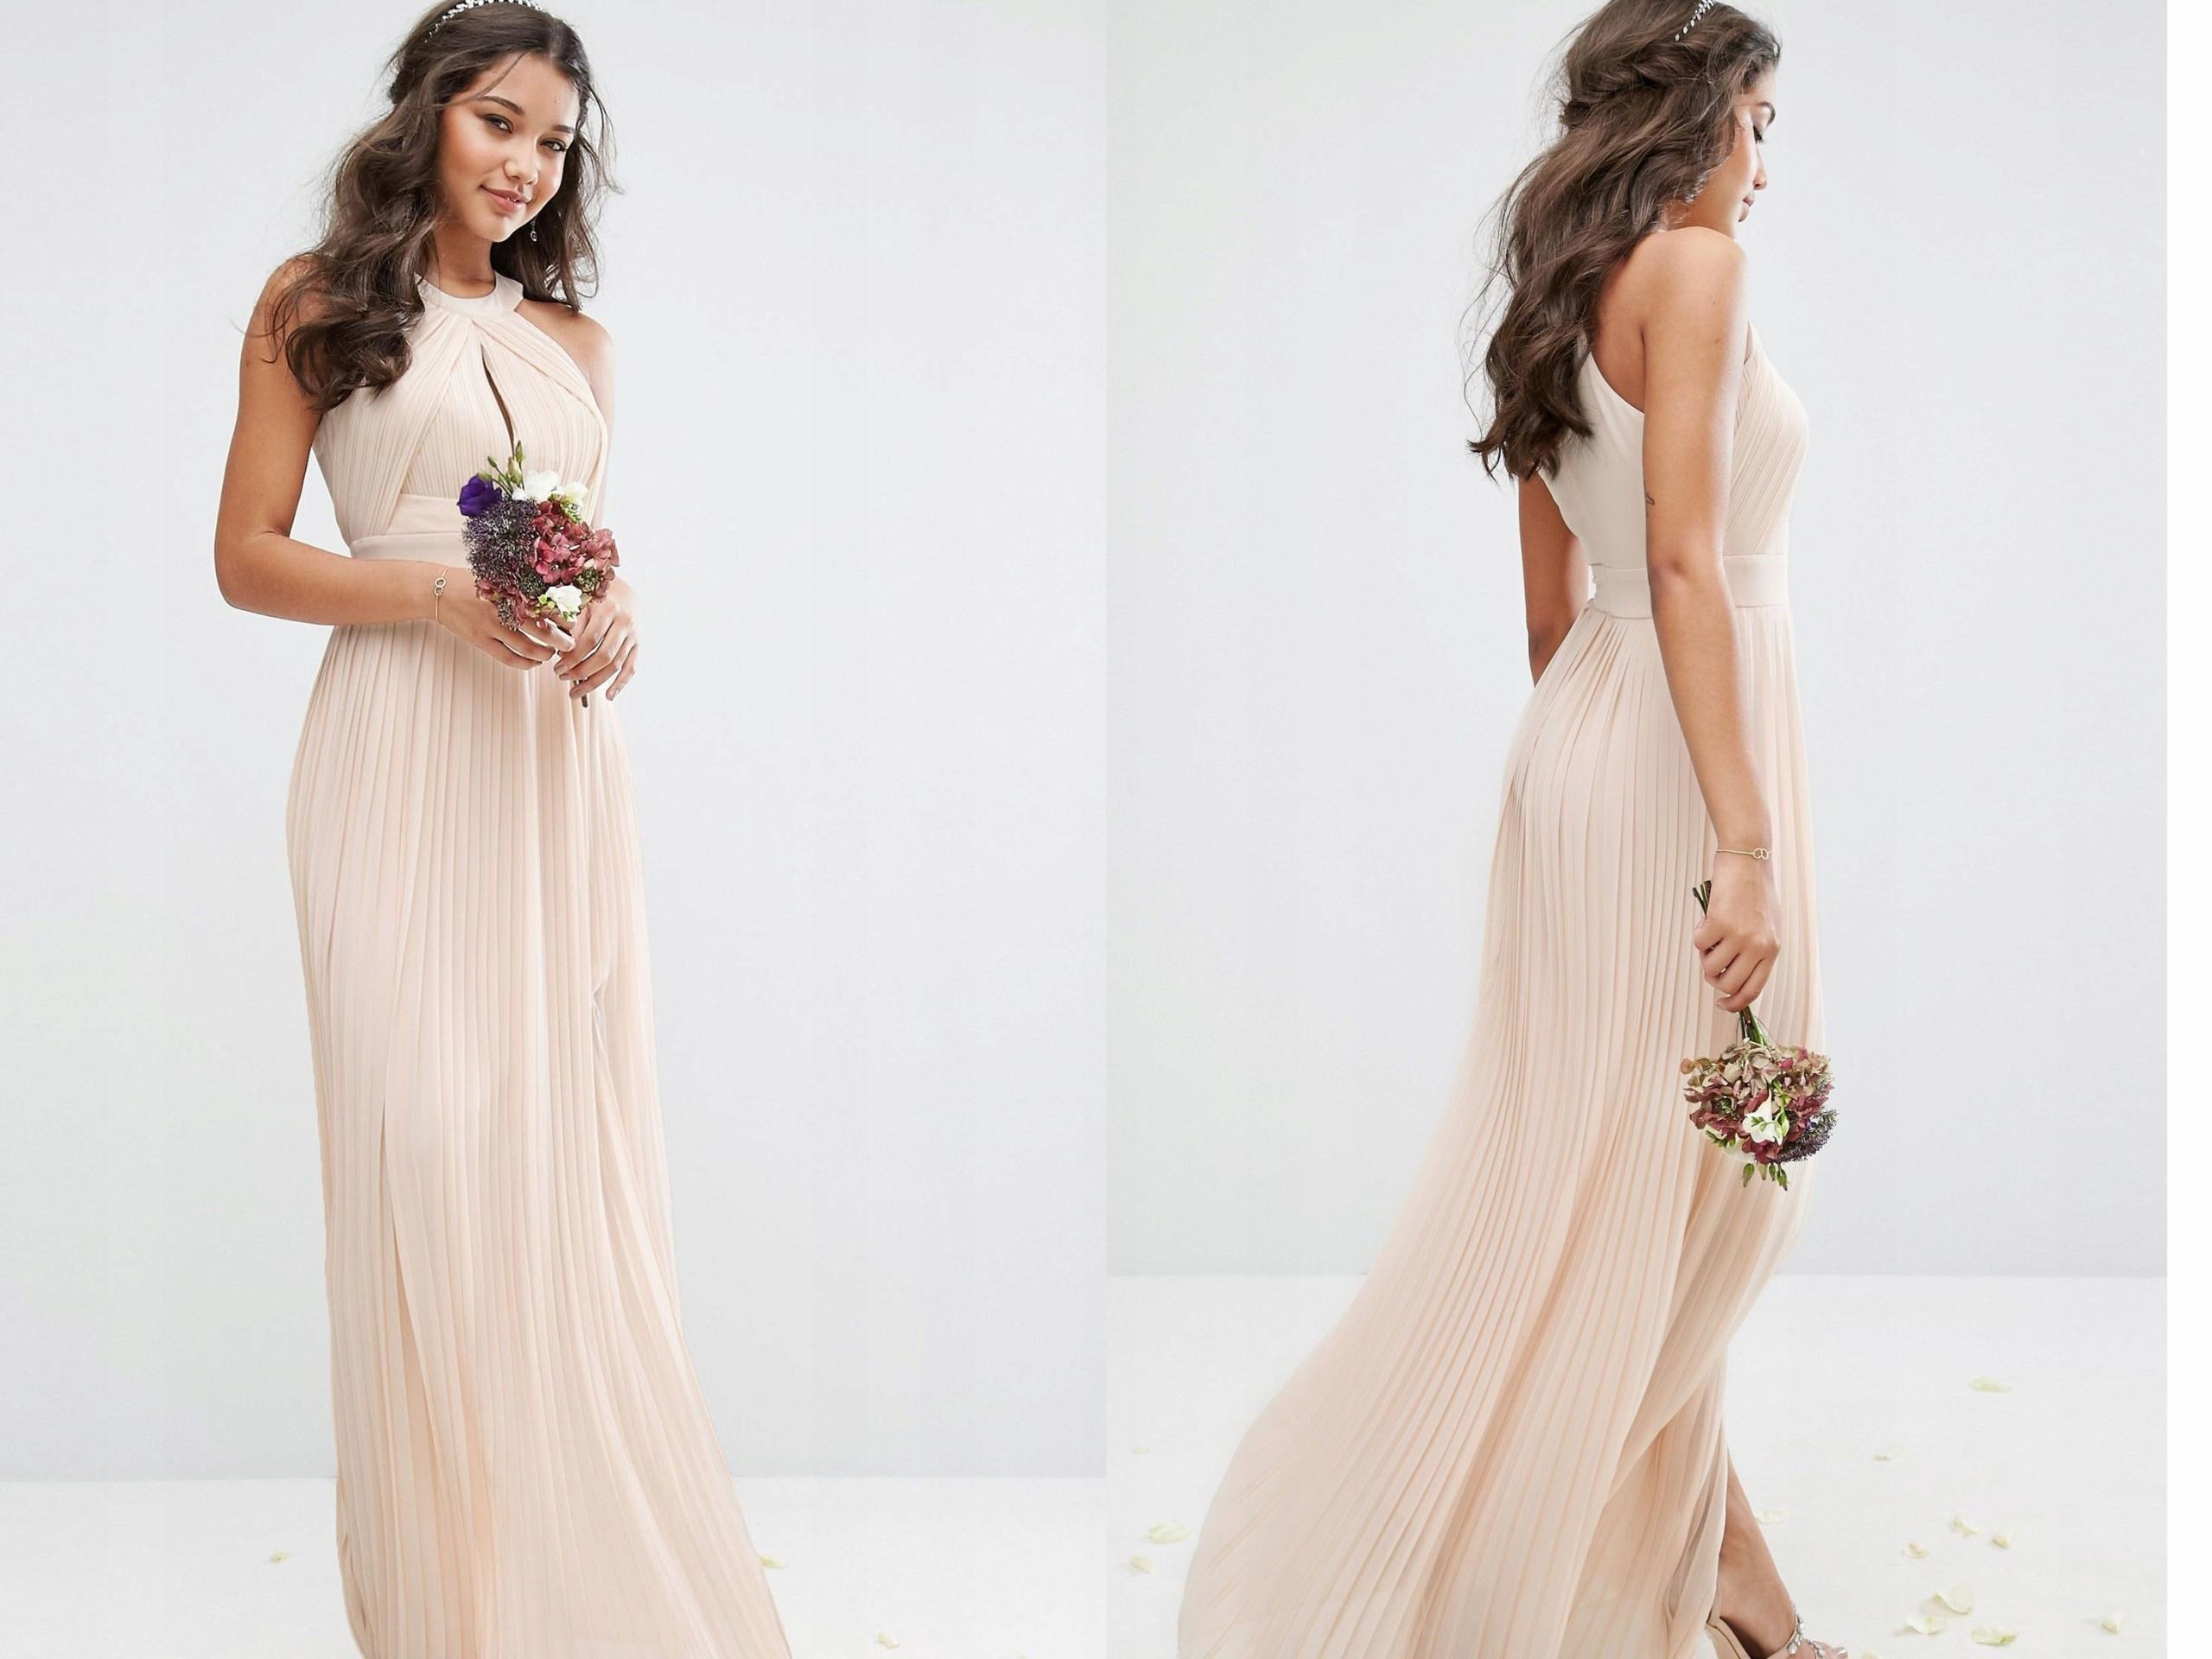 bae576deab TFNC Plisowana Kremowa Sukienka Maxi M 38 - 7436266088 - oficjalne ...